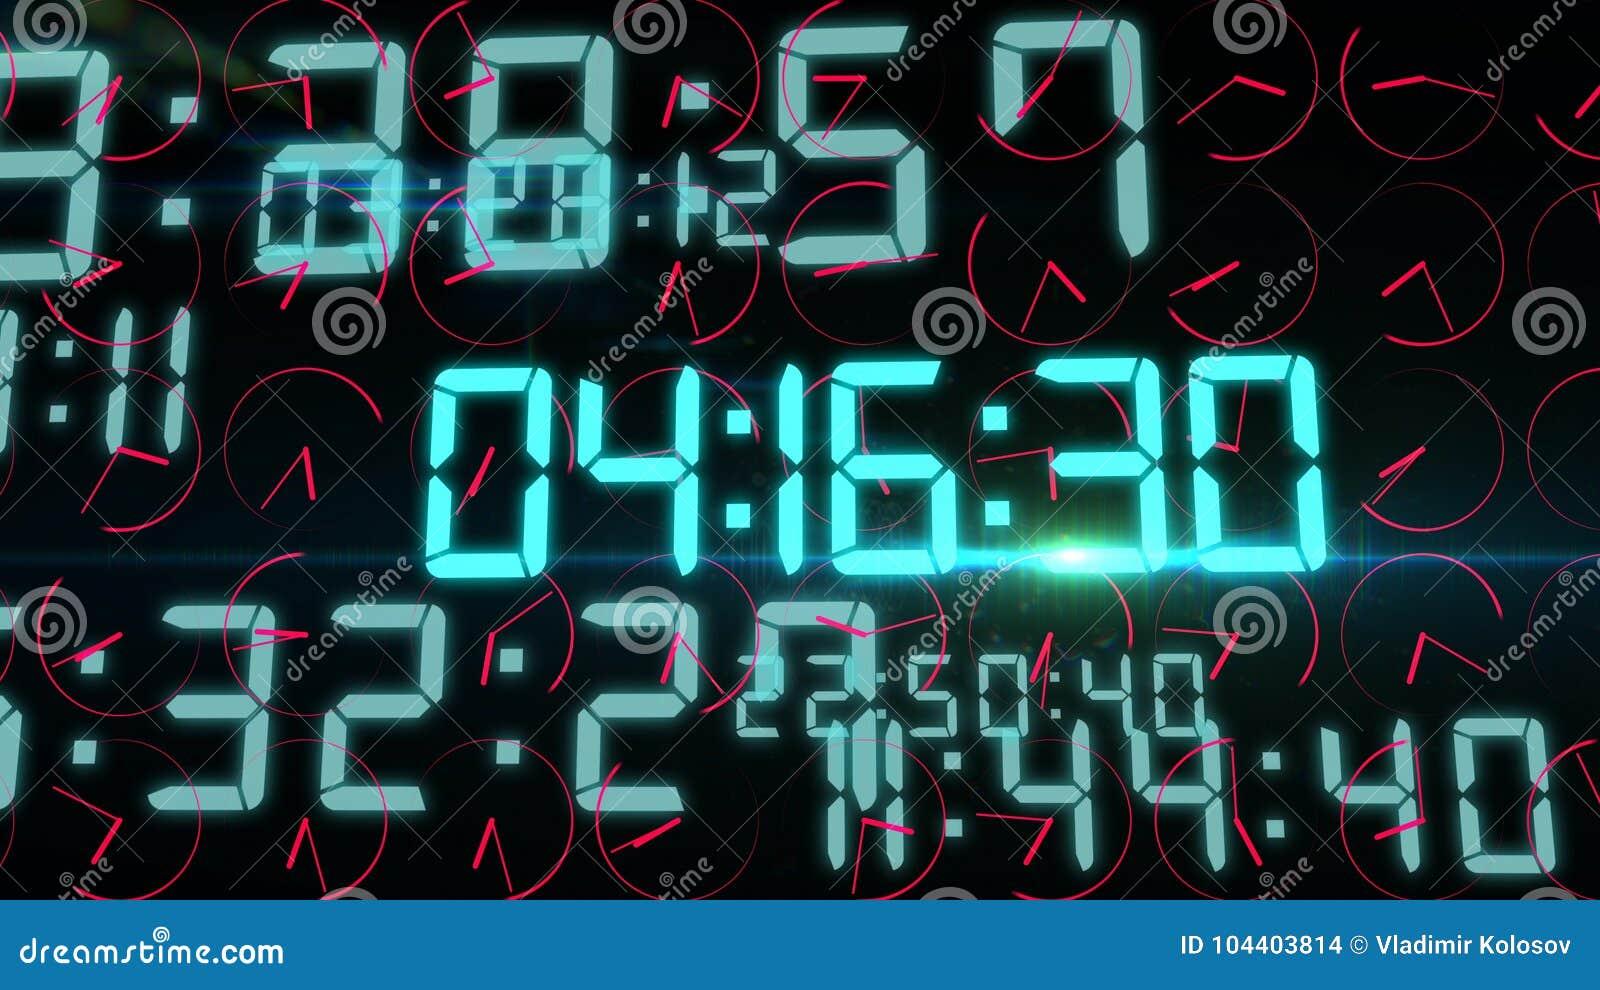 Digital Time Screen Illustration Stock Illustration - Illustration